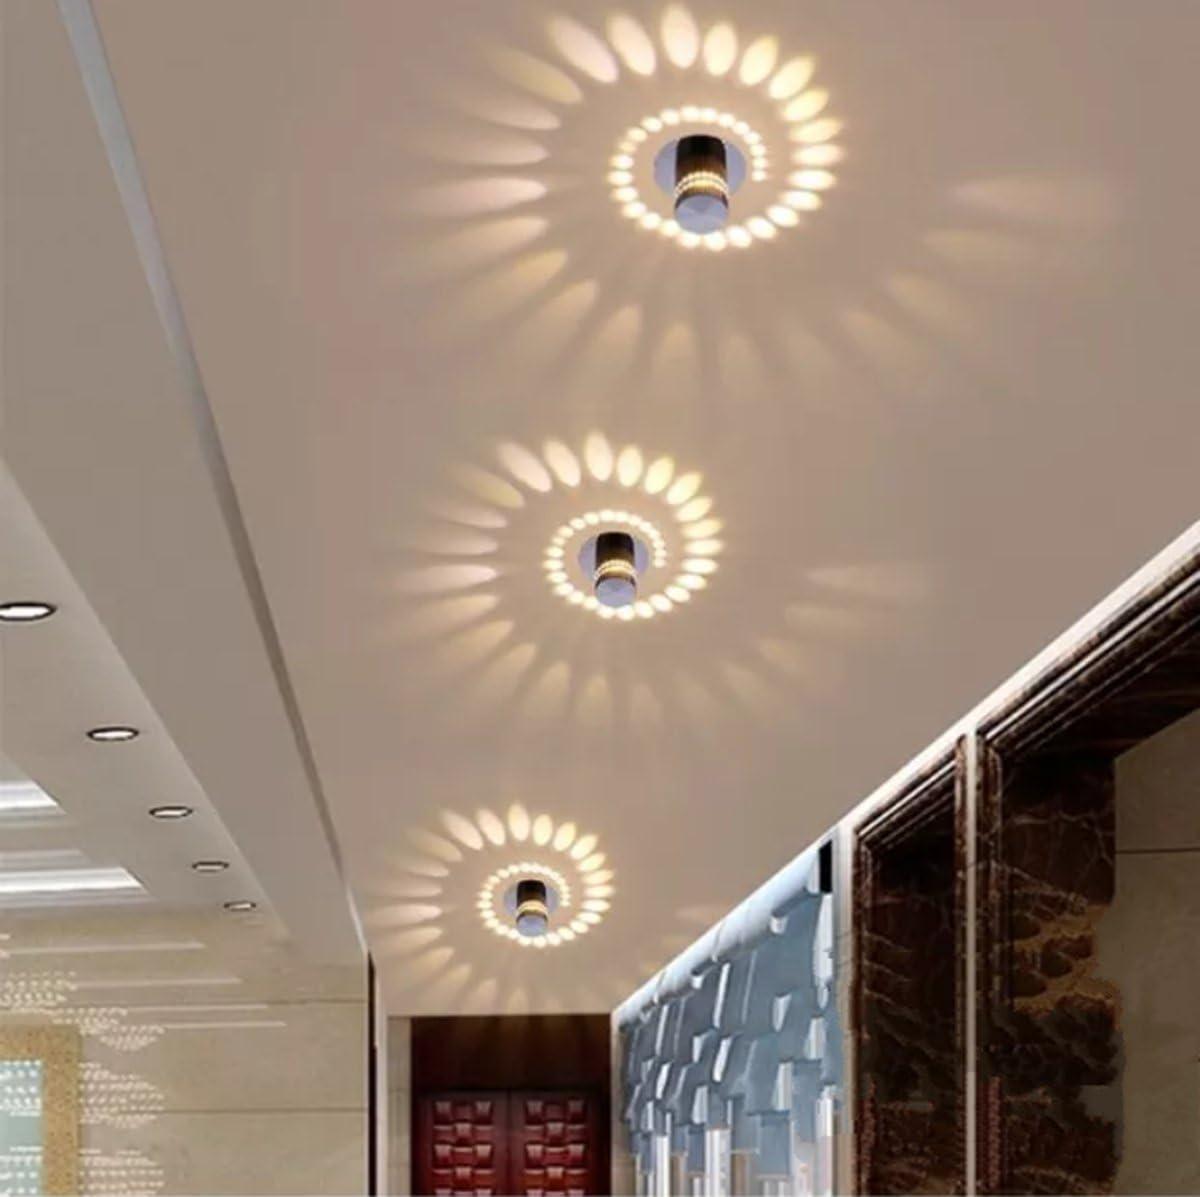 Interior Ceiling Light Ceiling Spot For Hallway Bedroom Living Room Bathroom Stairs Corridor Warm White Amazon Co Uk Lighting